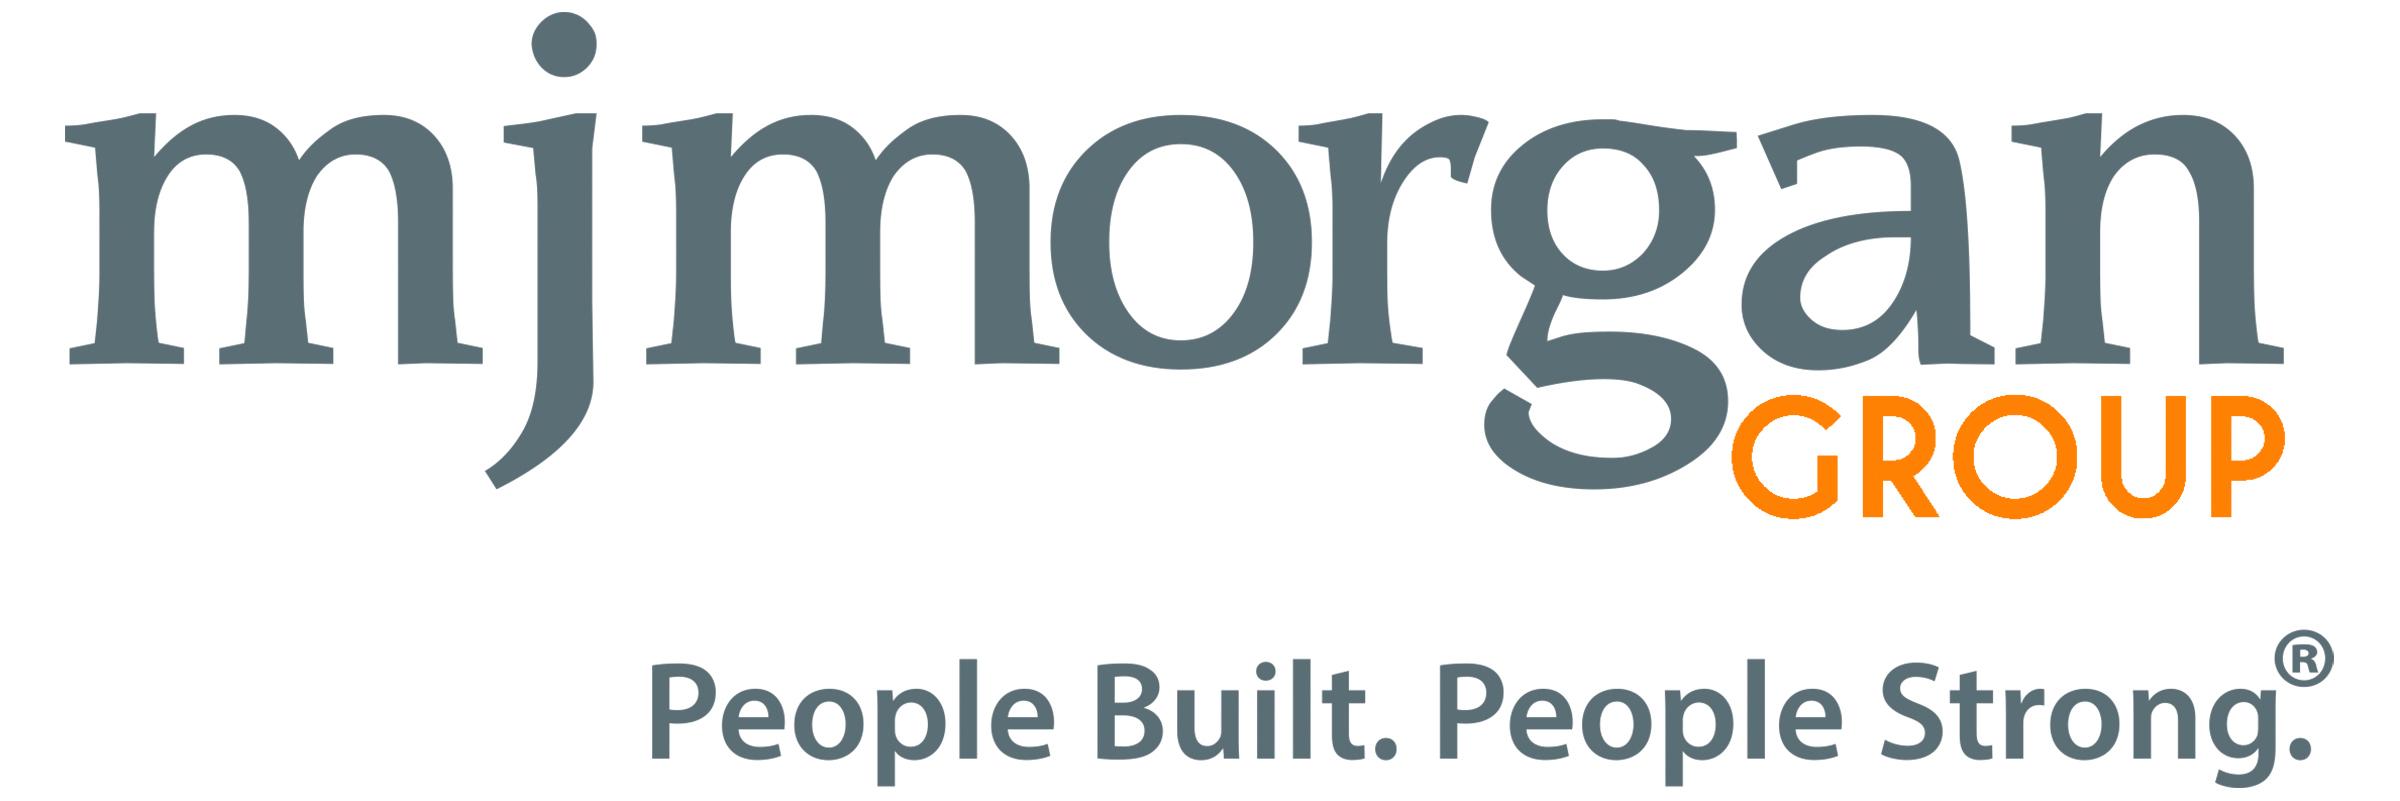 MJ Morgan Group